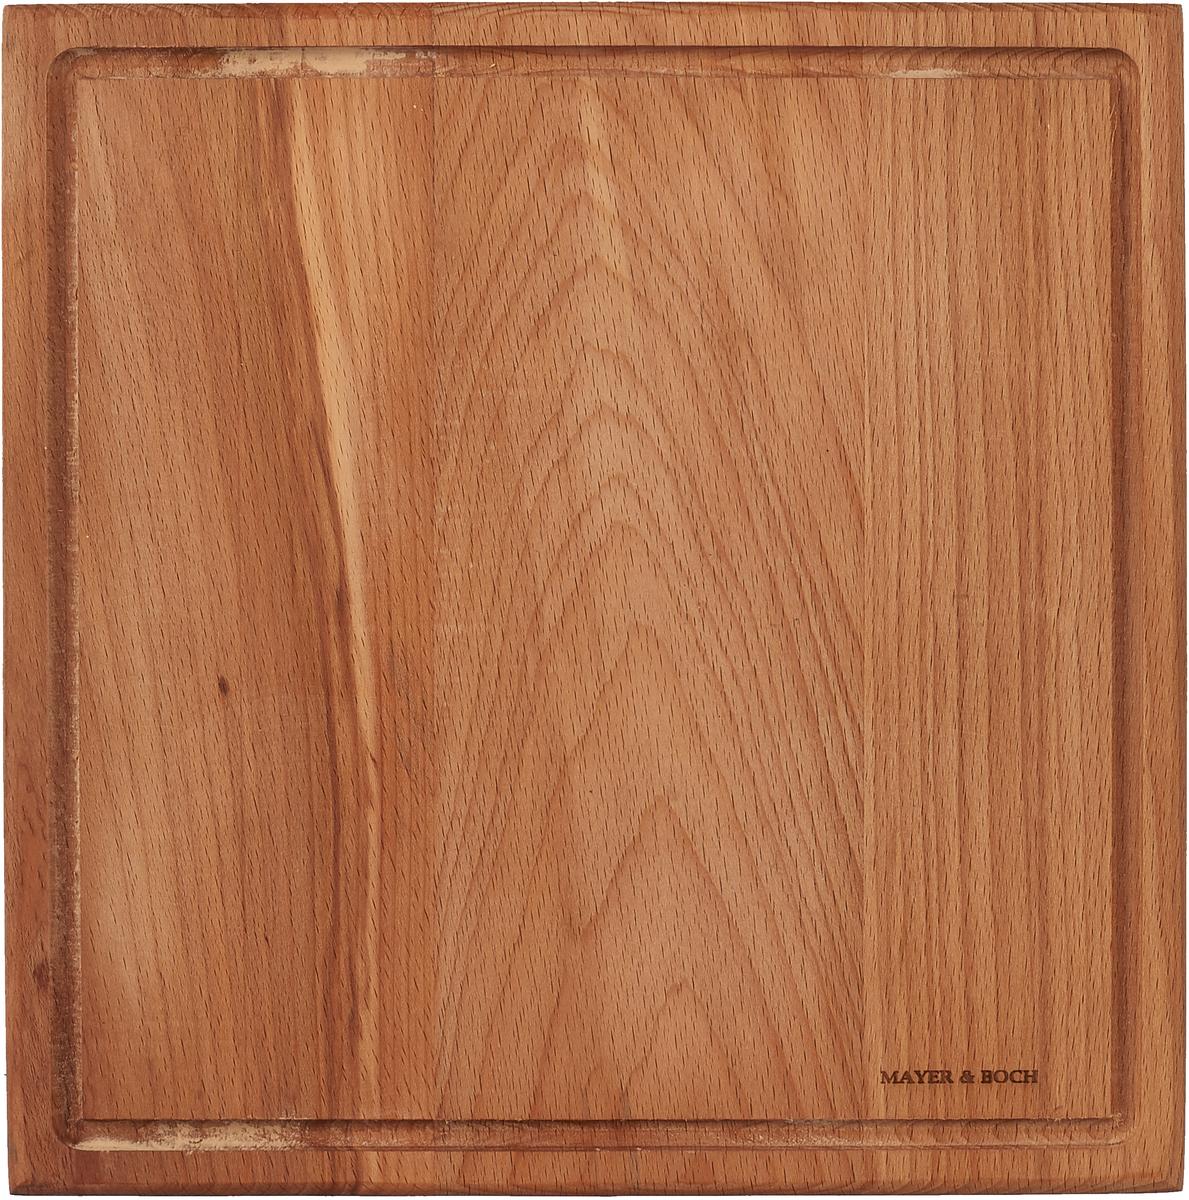 цена на Разделочная доска Mayer & Boch, 40026, коричневый, 25 х 25 см